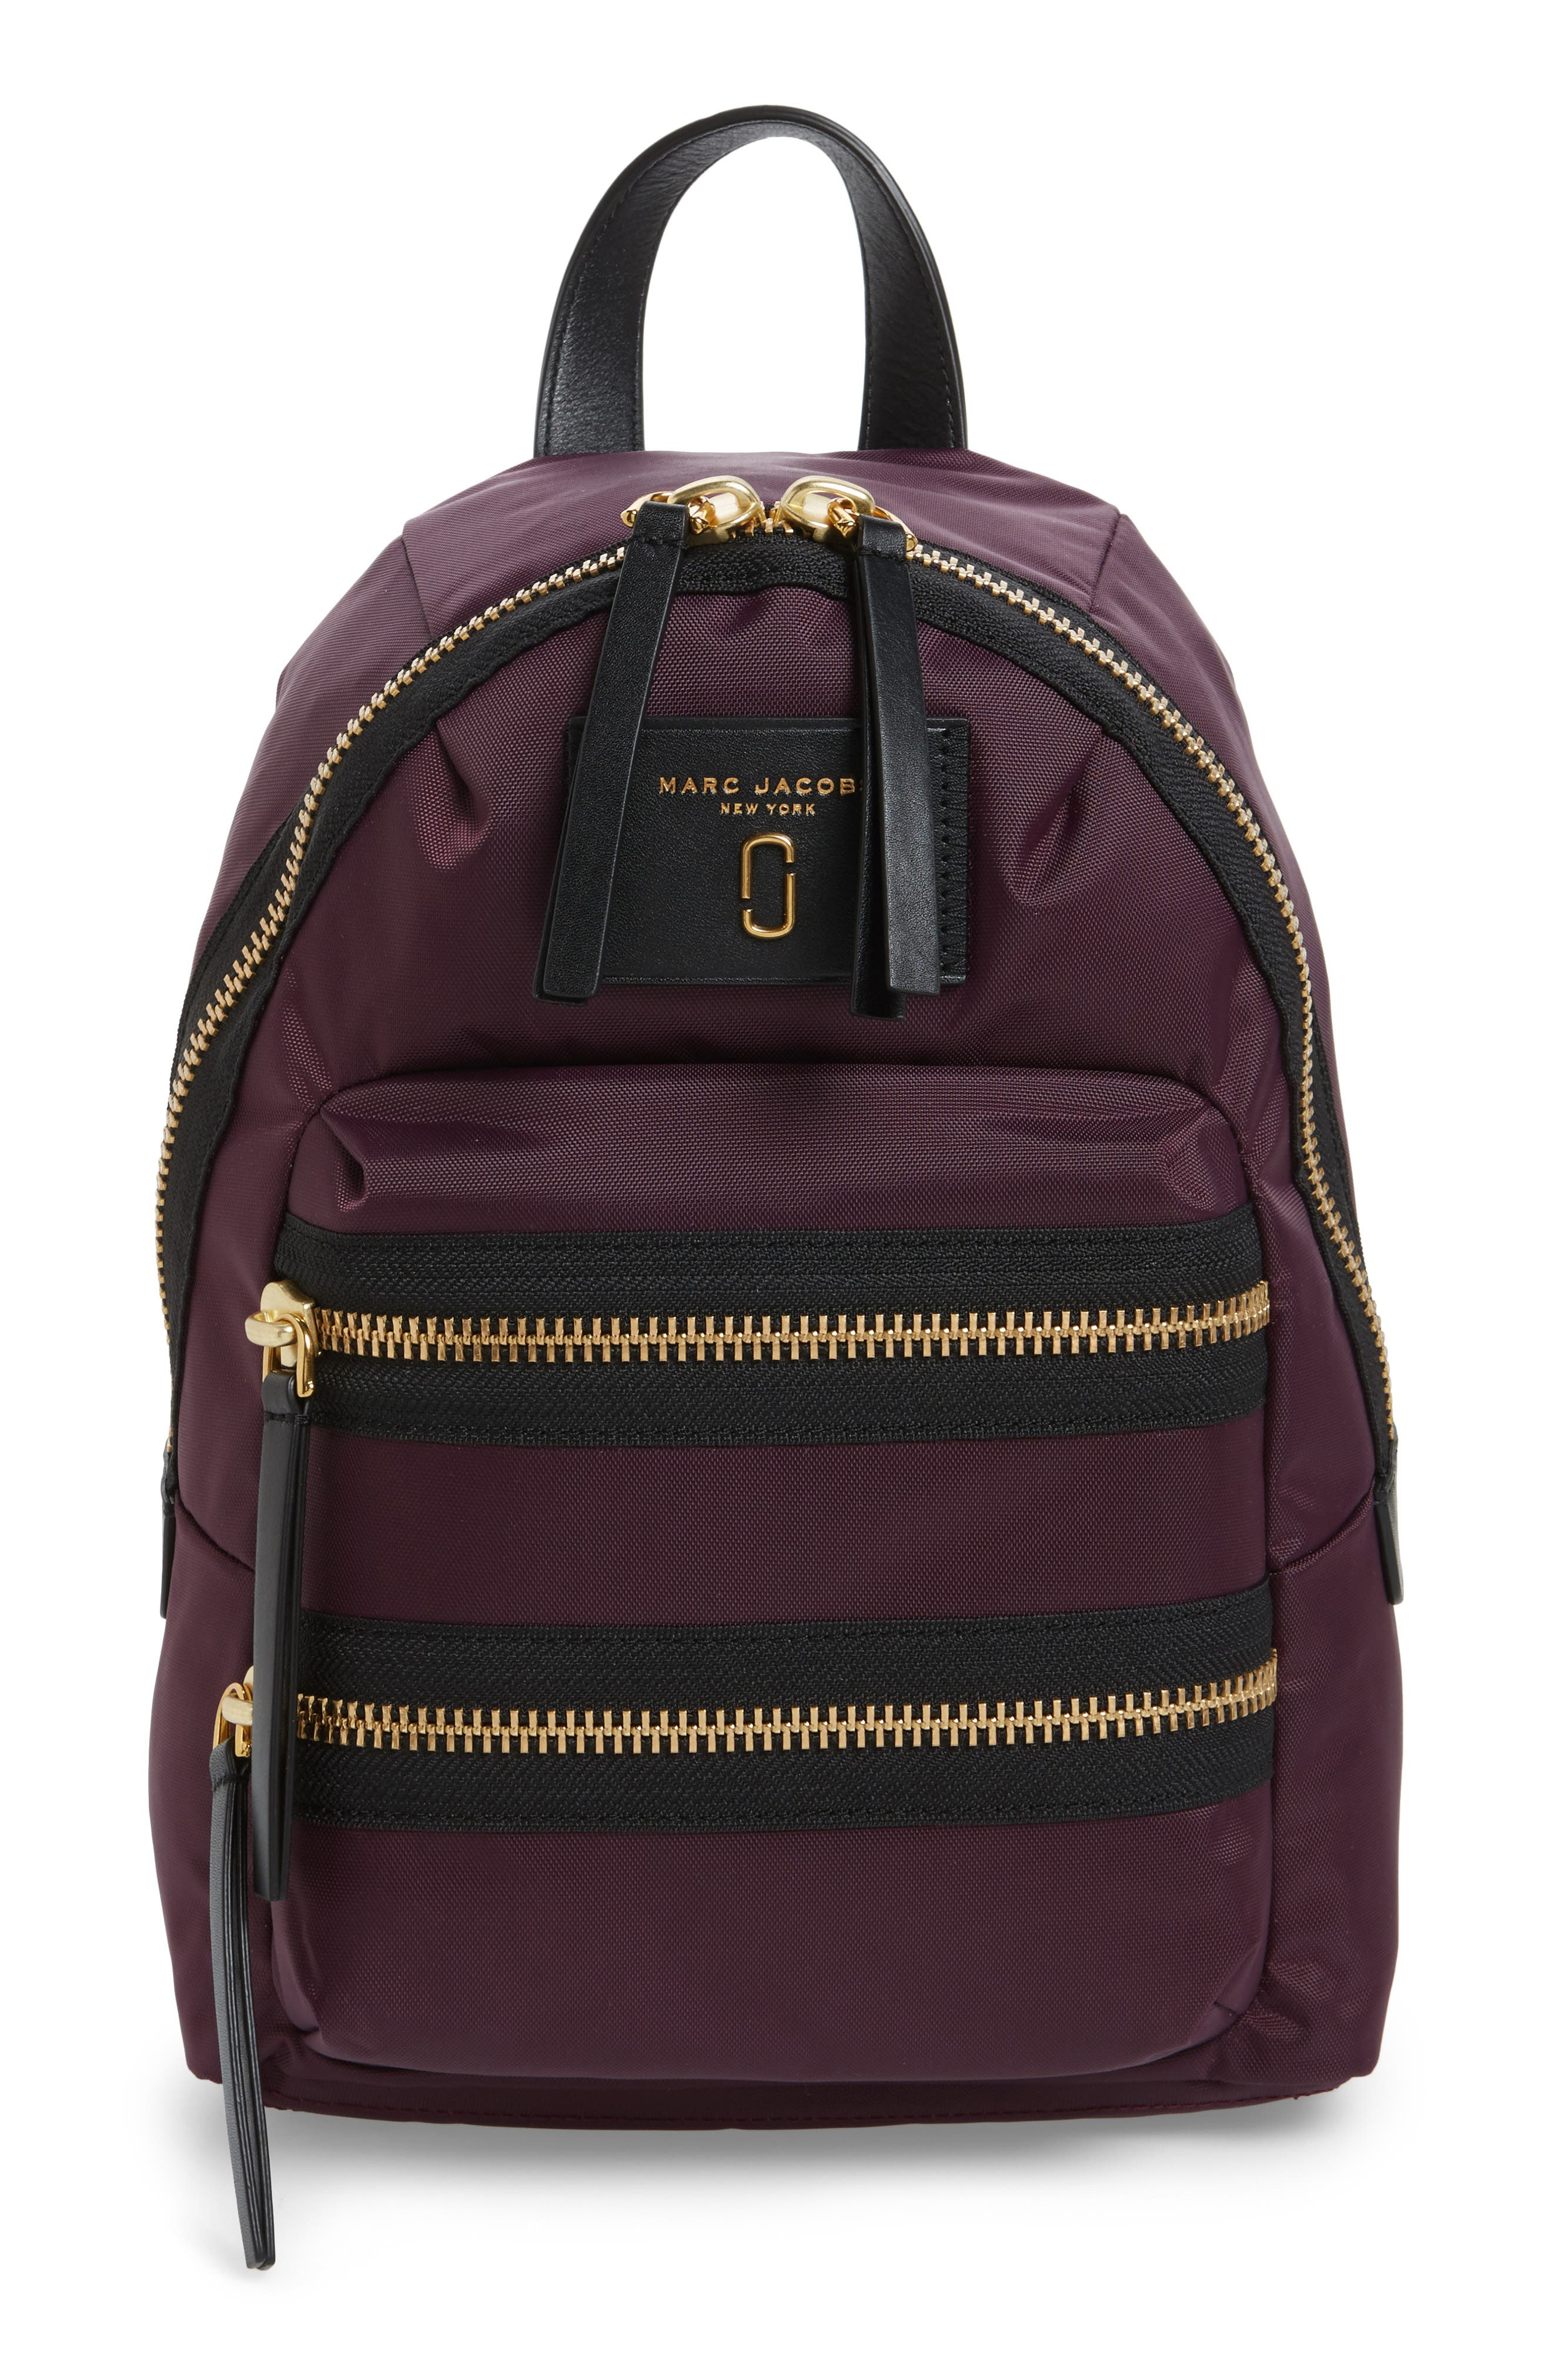 MARC JACOBS Mini Biker Nylon Backpack